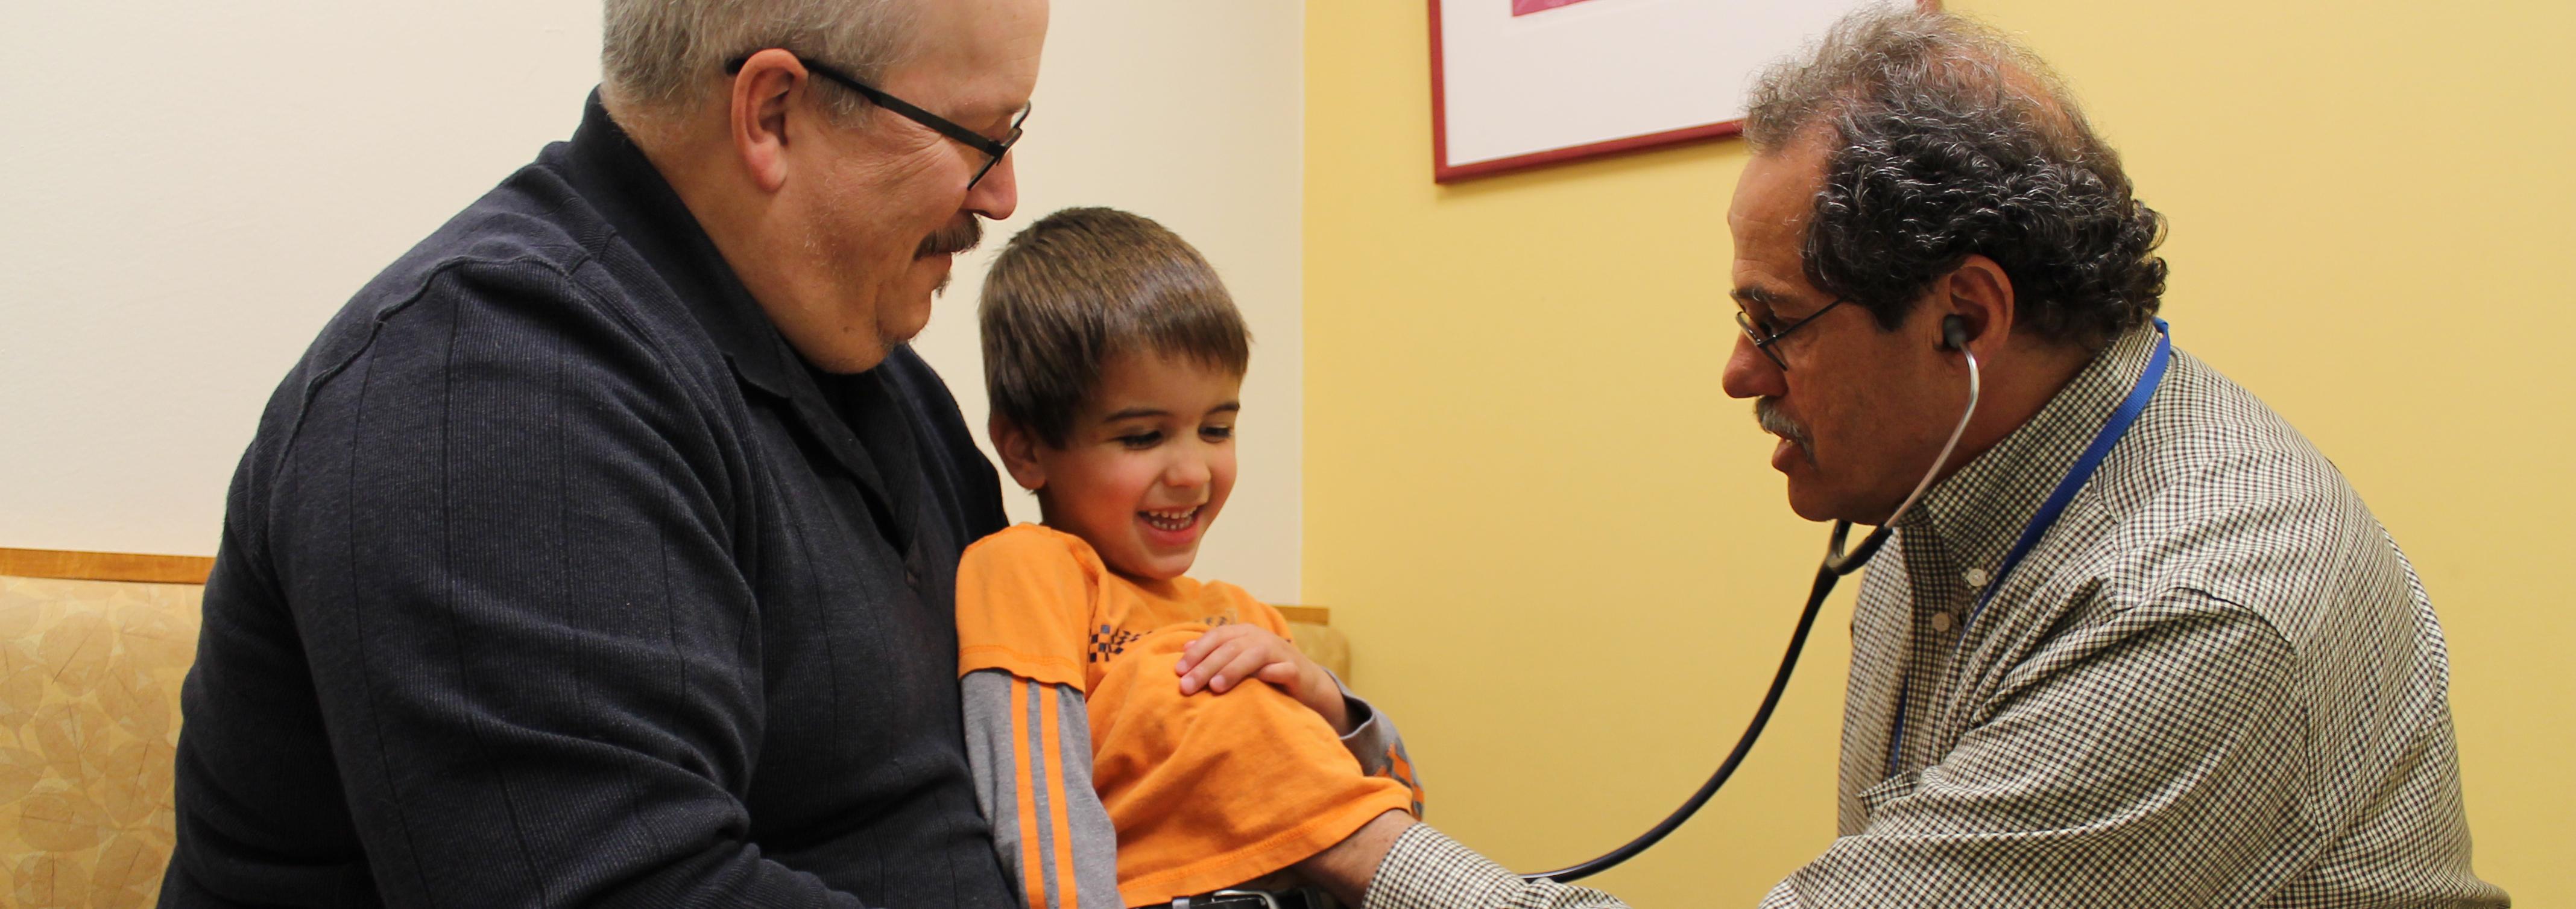 SCCHC Pediatrics appointment.JPG